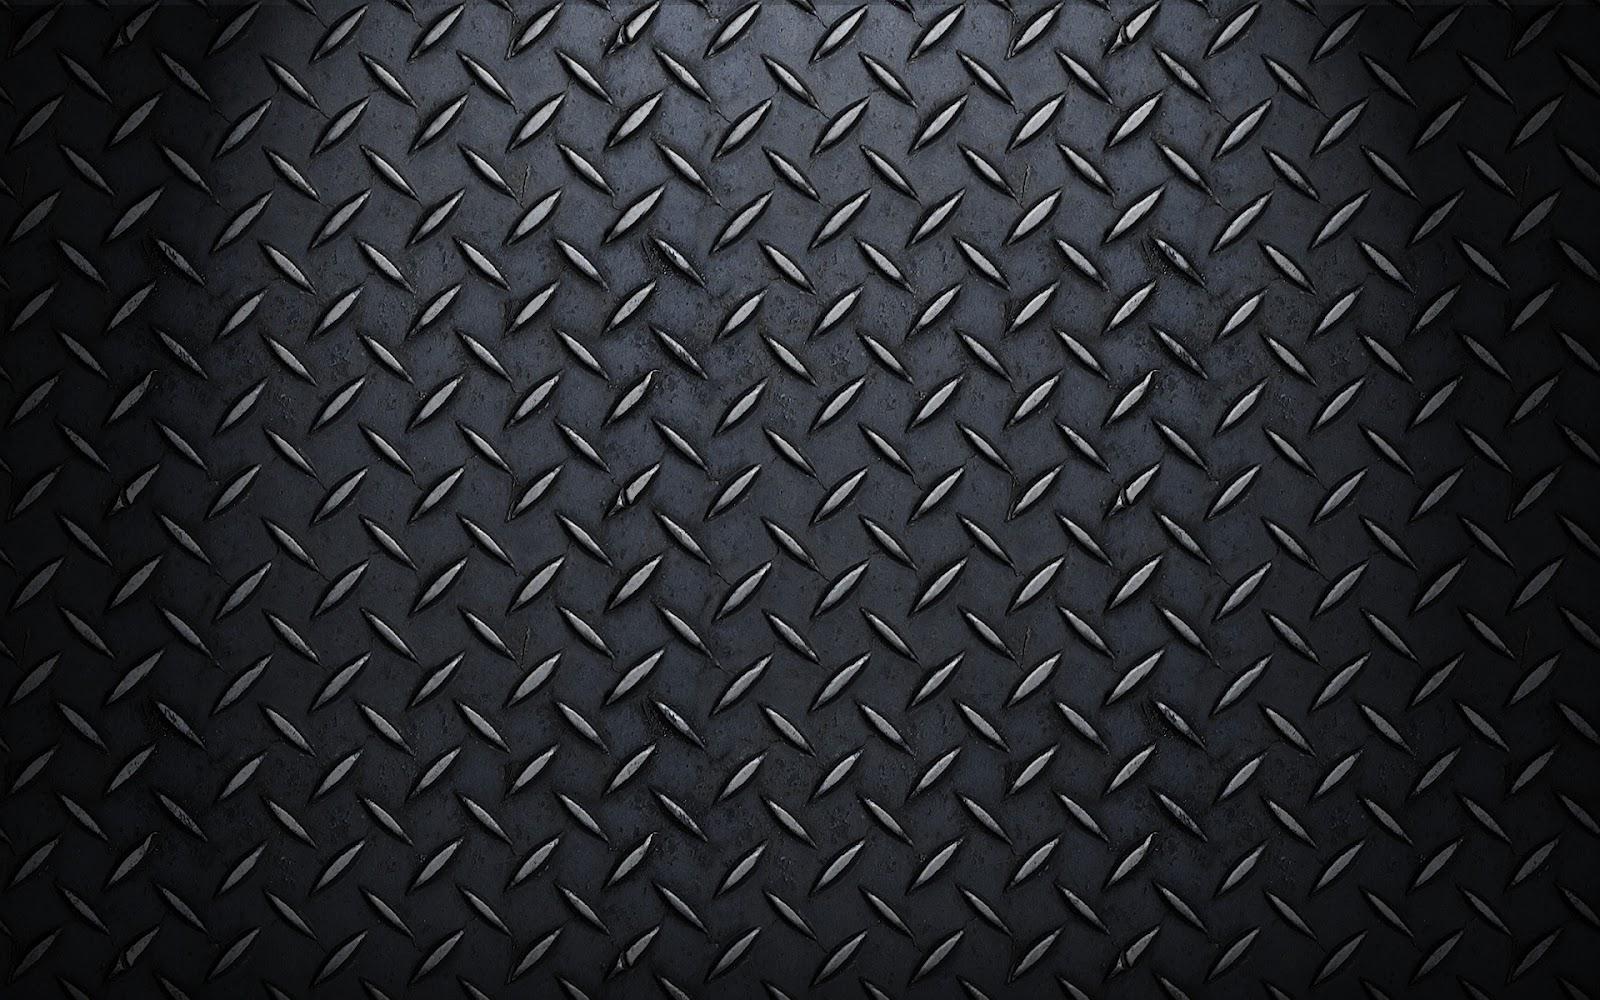 Mr A 1920x1200 HD Website Backgrounds 1600x1000